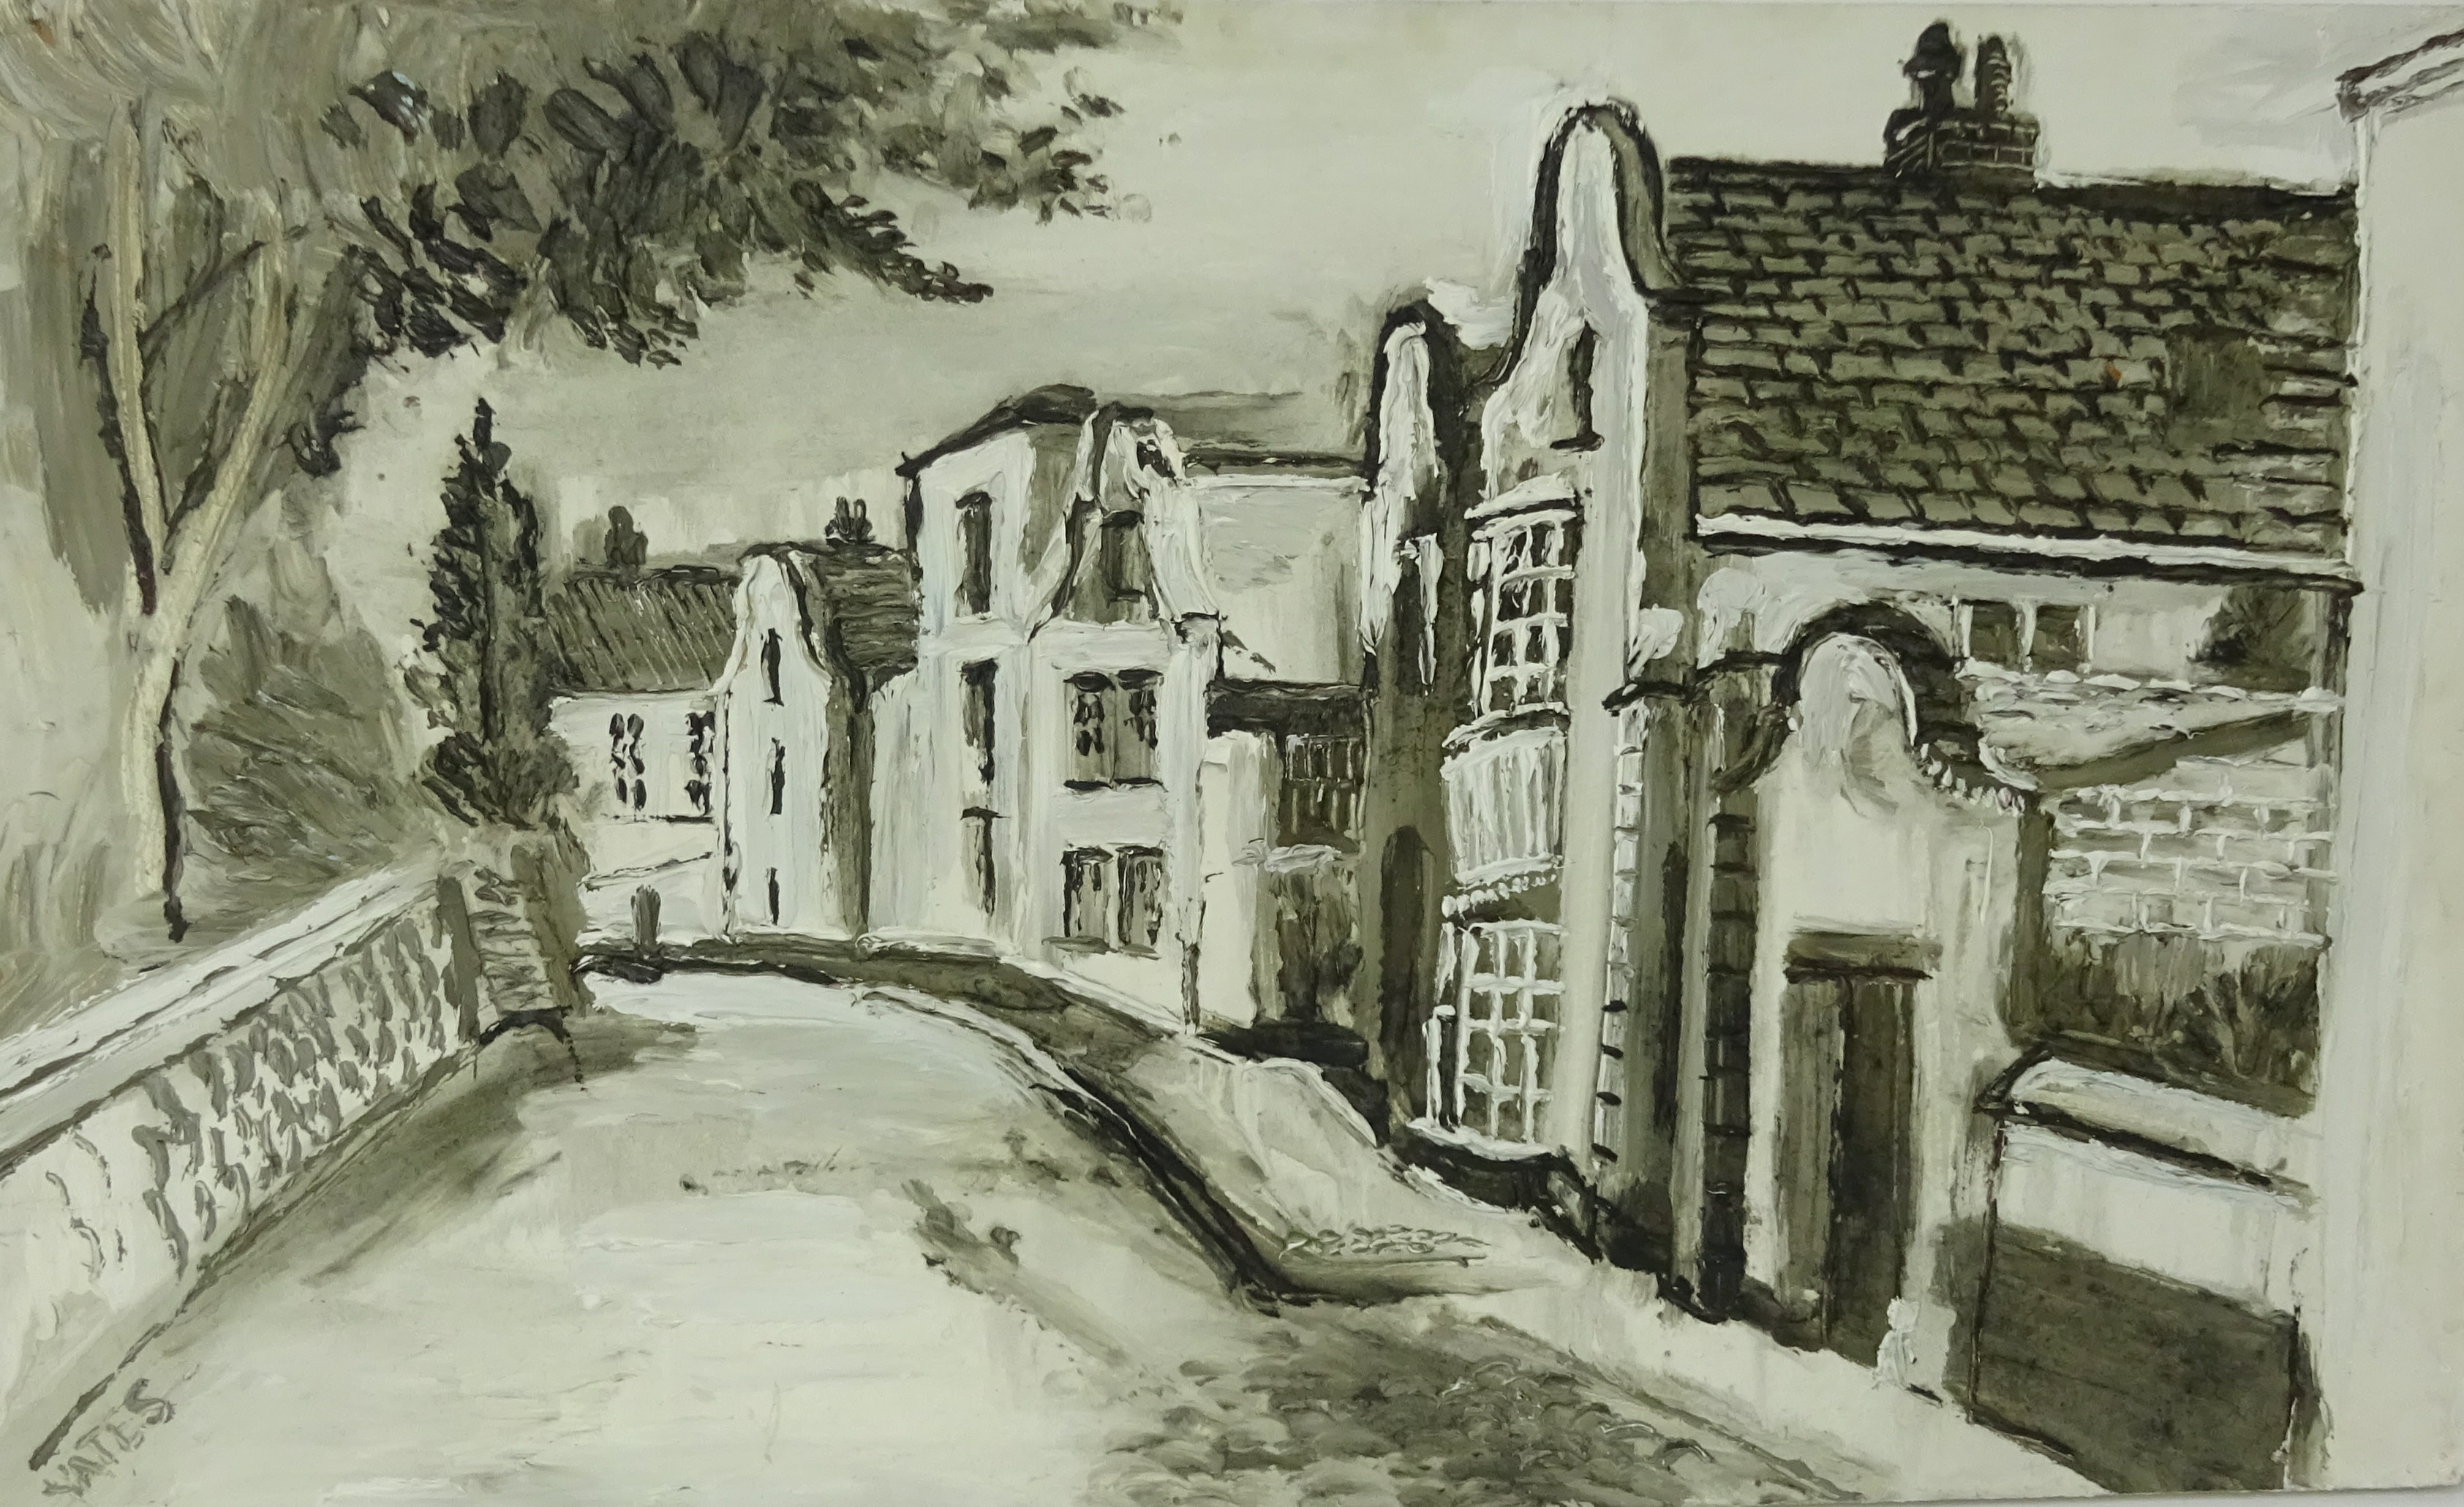 Lot 017 - Fred Yates (1922-2008), monotone oil on board, 'Street Scene', signed, 48cm x 80cm.